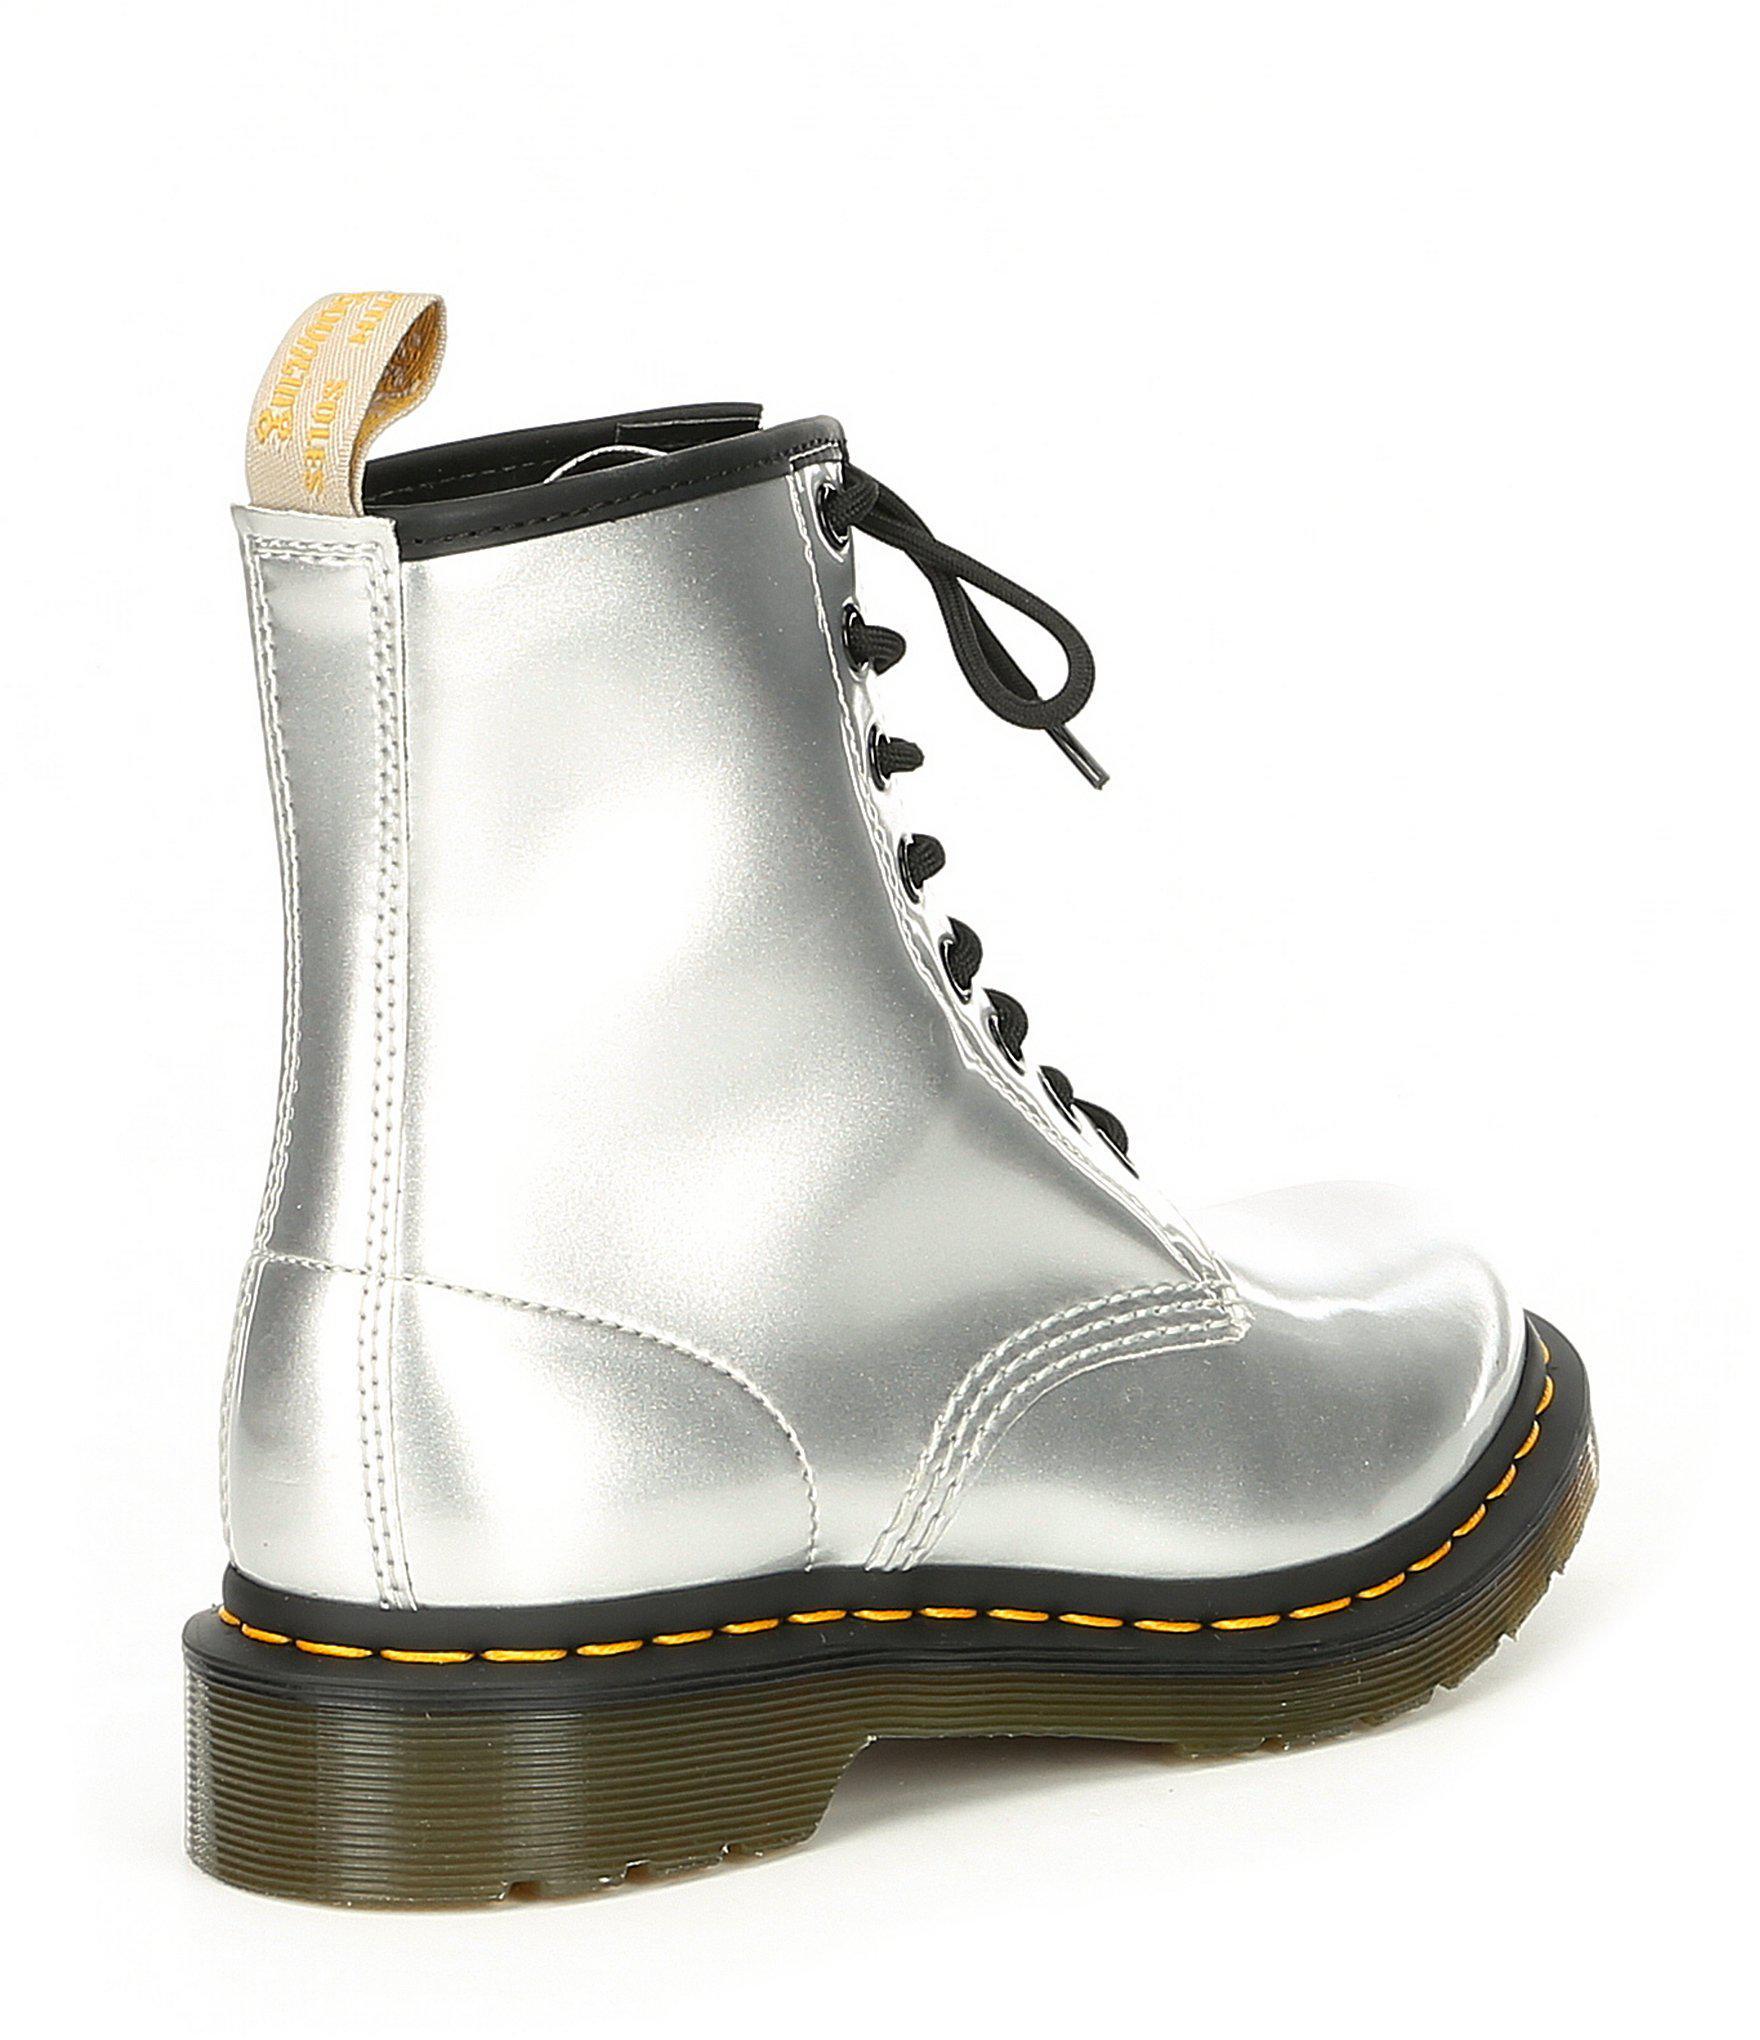 b1c6a5955dfcd Dr. Martens - Metallic 1460 Vegan Mid Boots - Lyst. View fullscreen